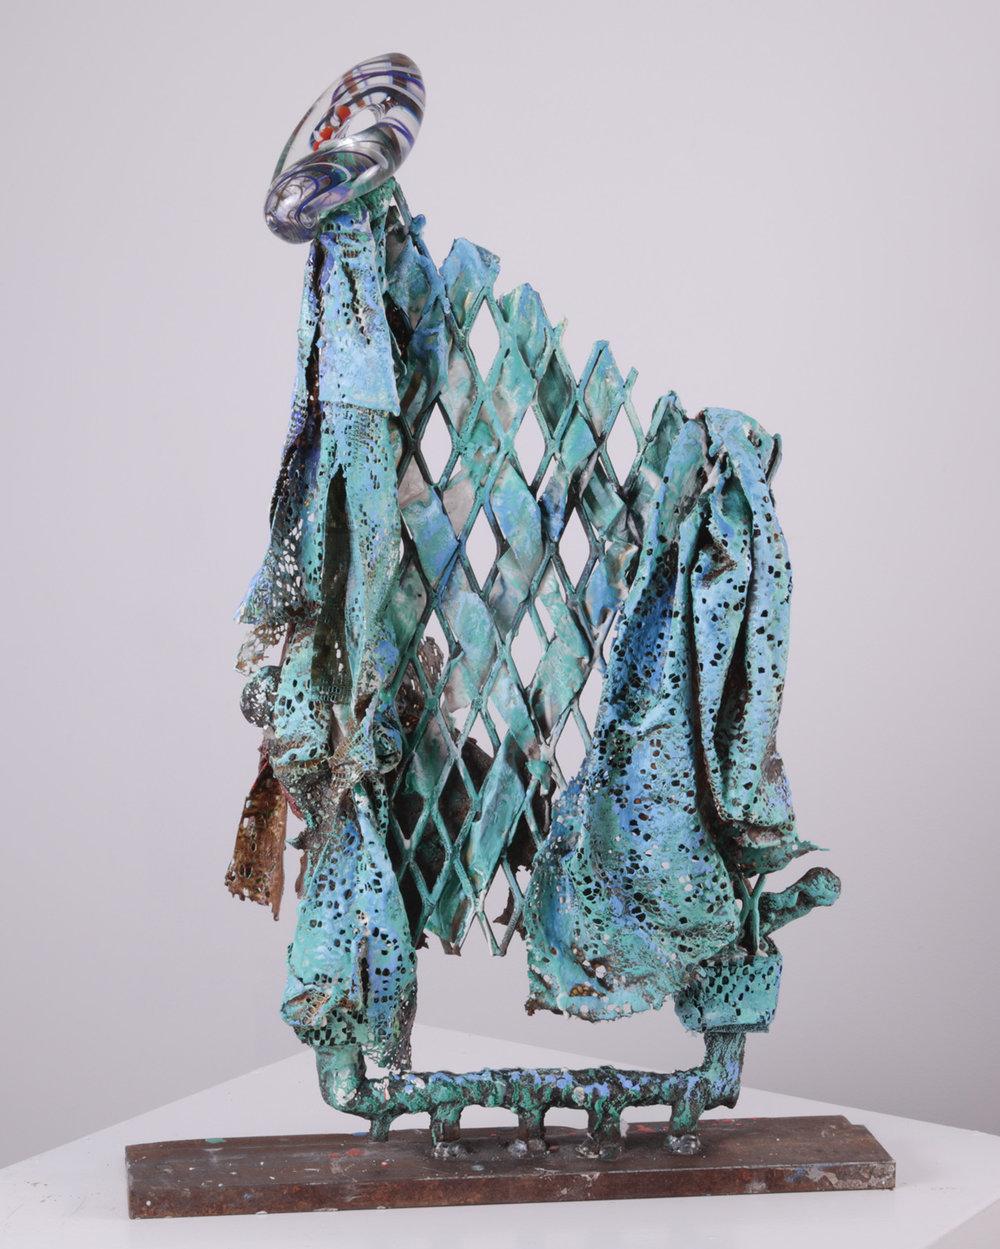 Darlington_RichRotting_Sculpture1.jpeg